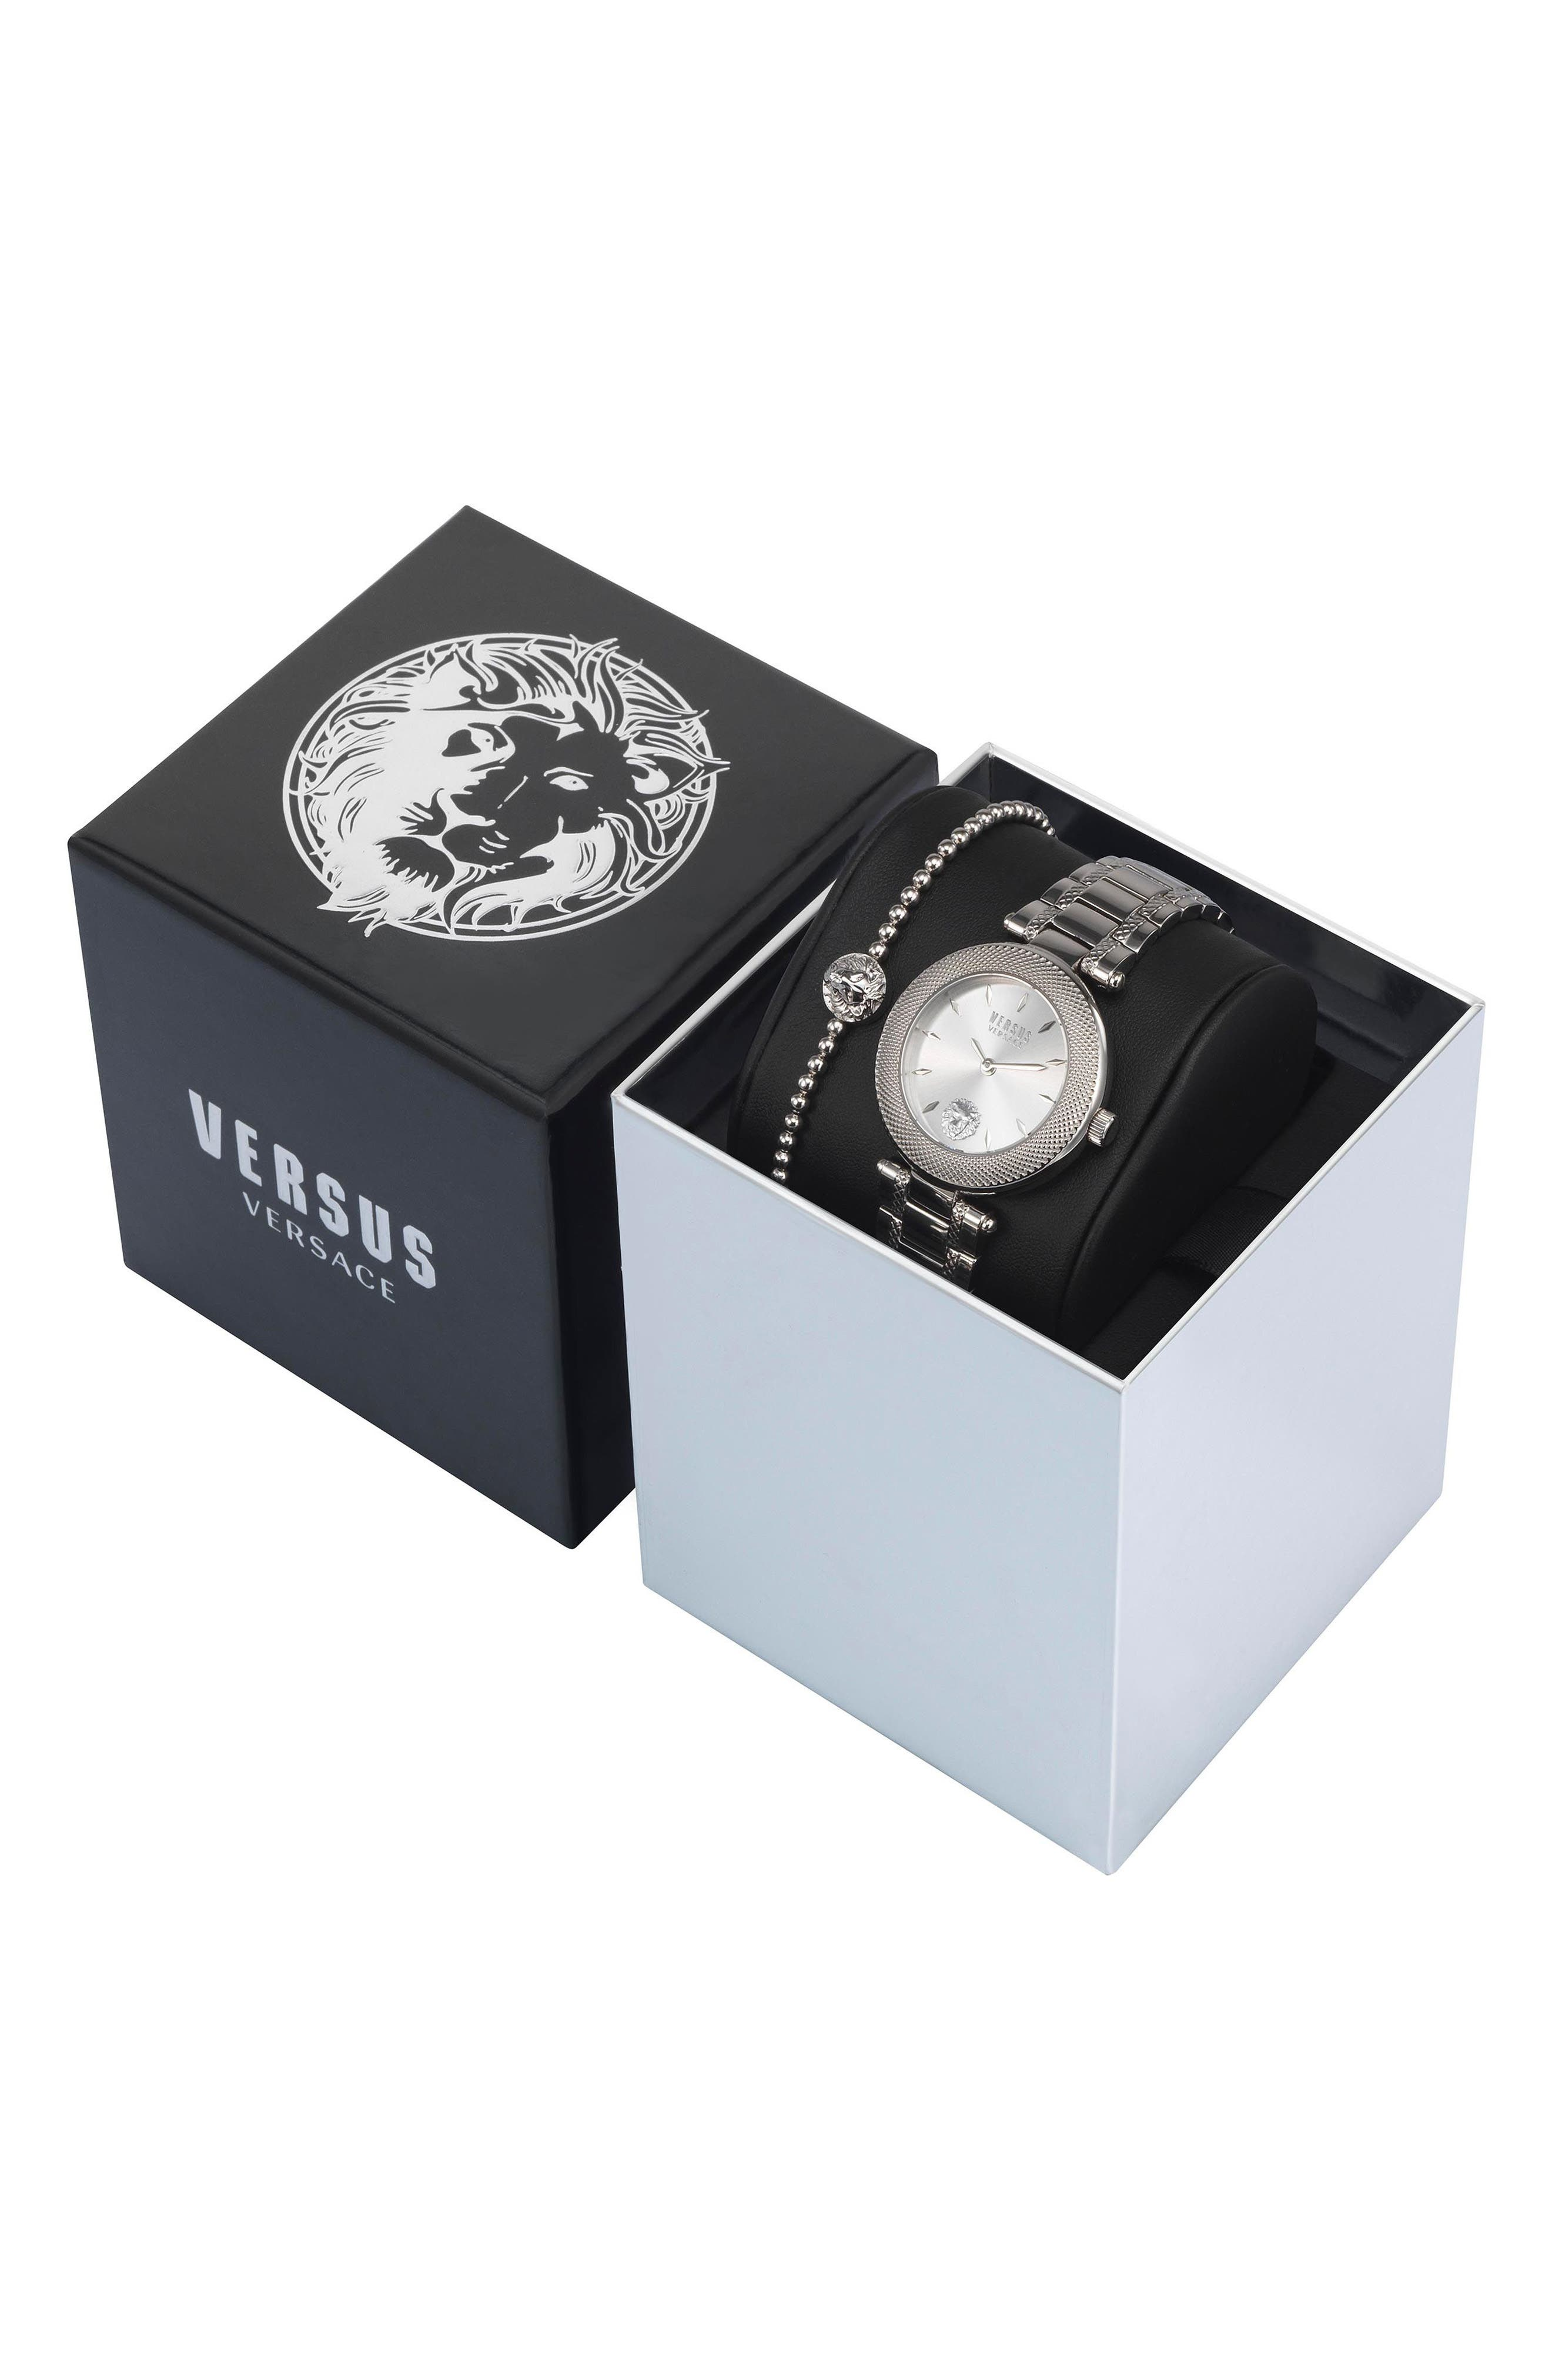 VERSUS VERSACE, Bricklane Watch Set, 36mm, Alternate thumbnail 4, color, SILVER